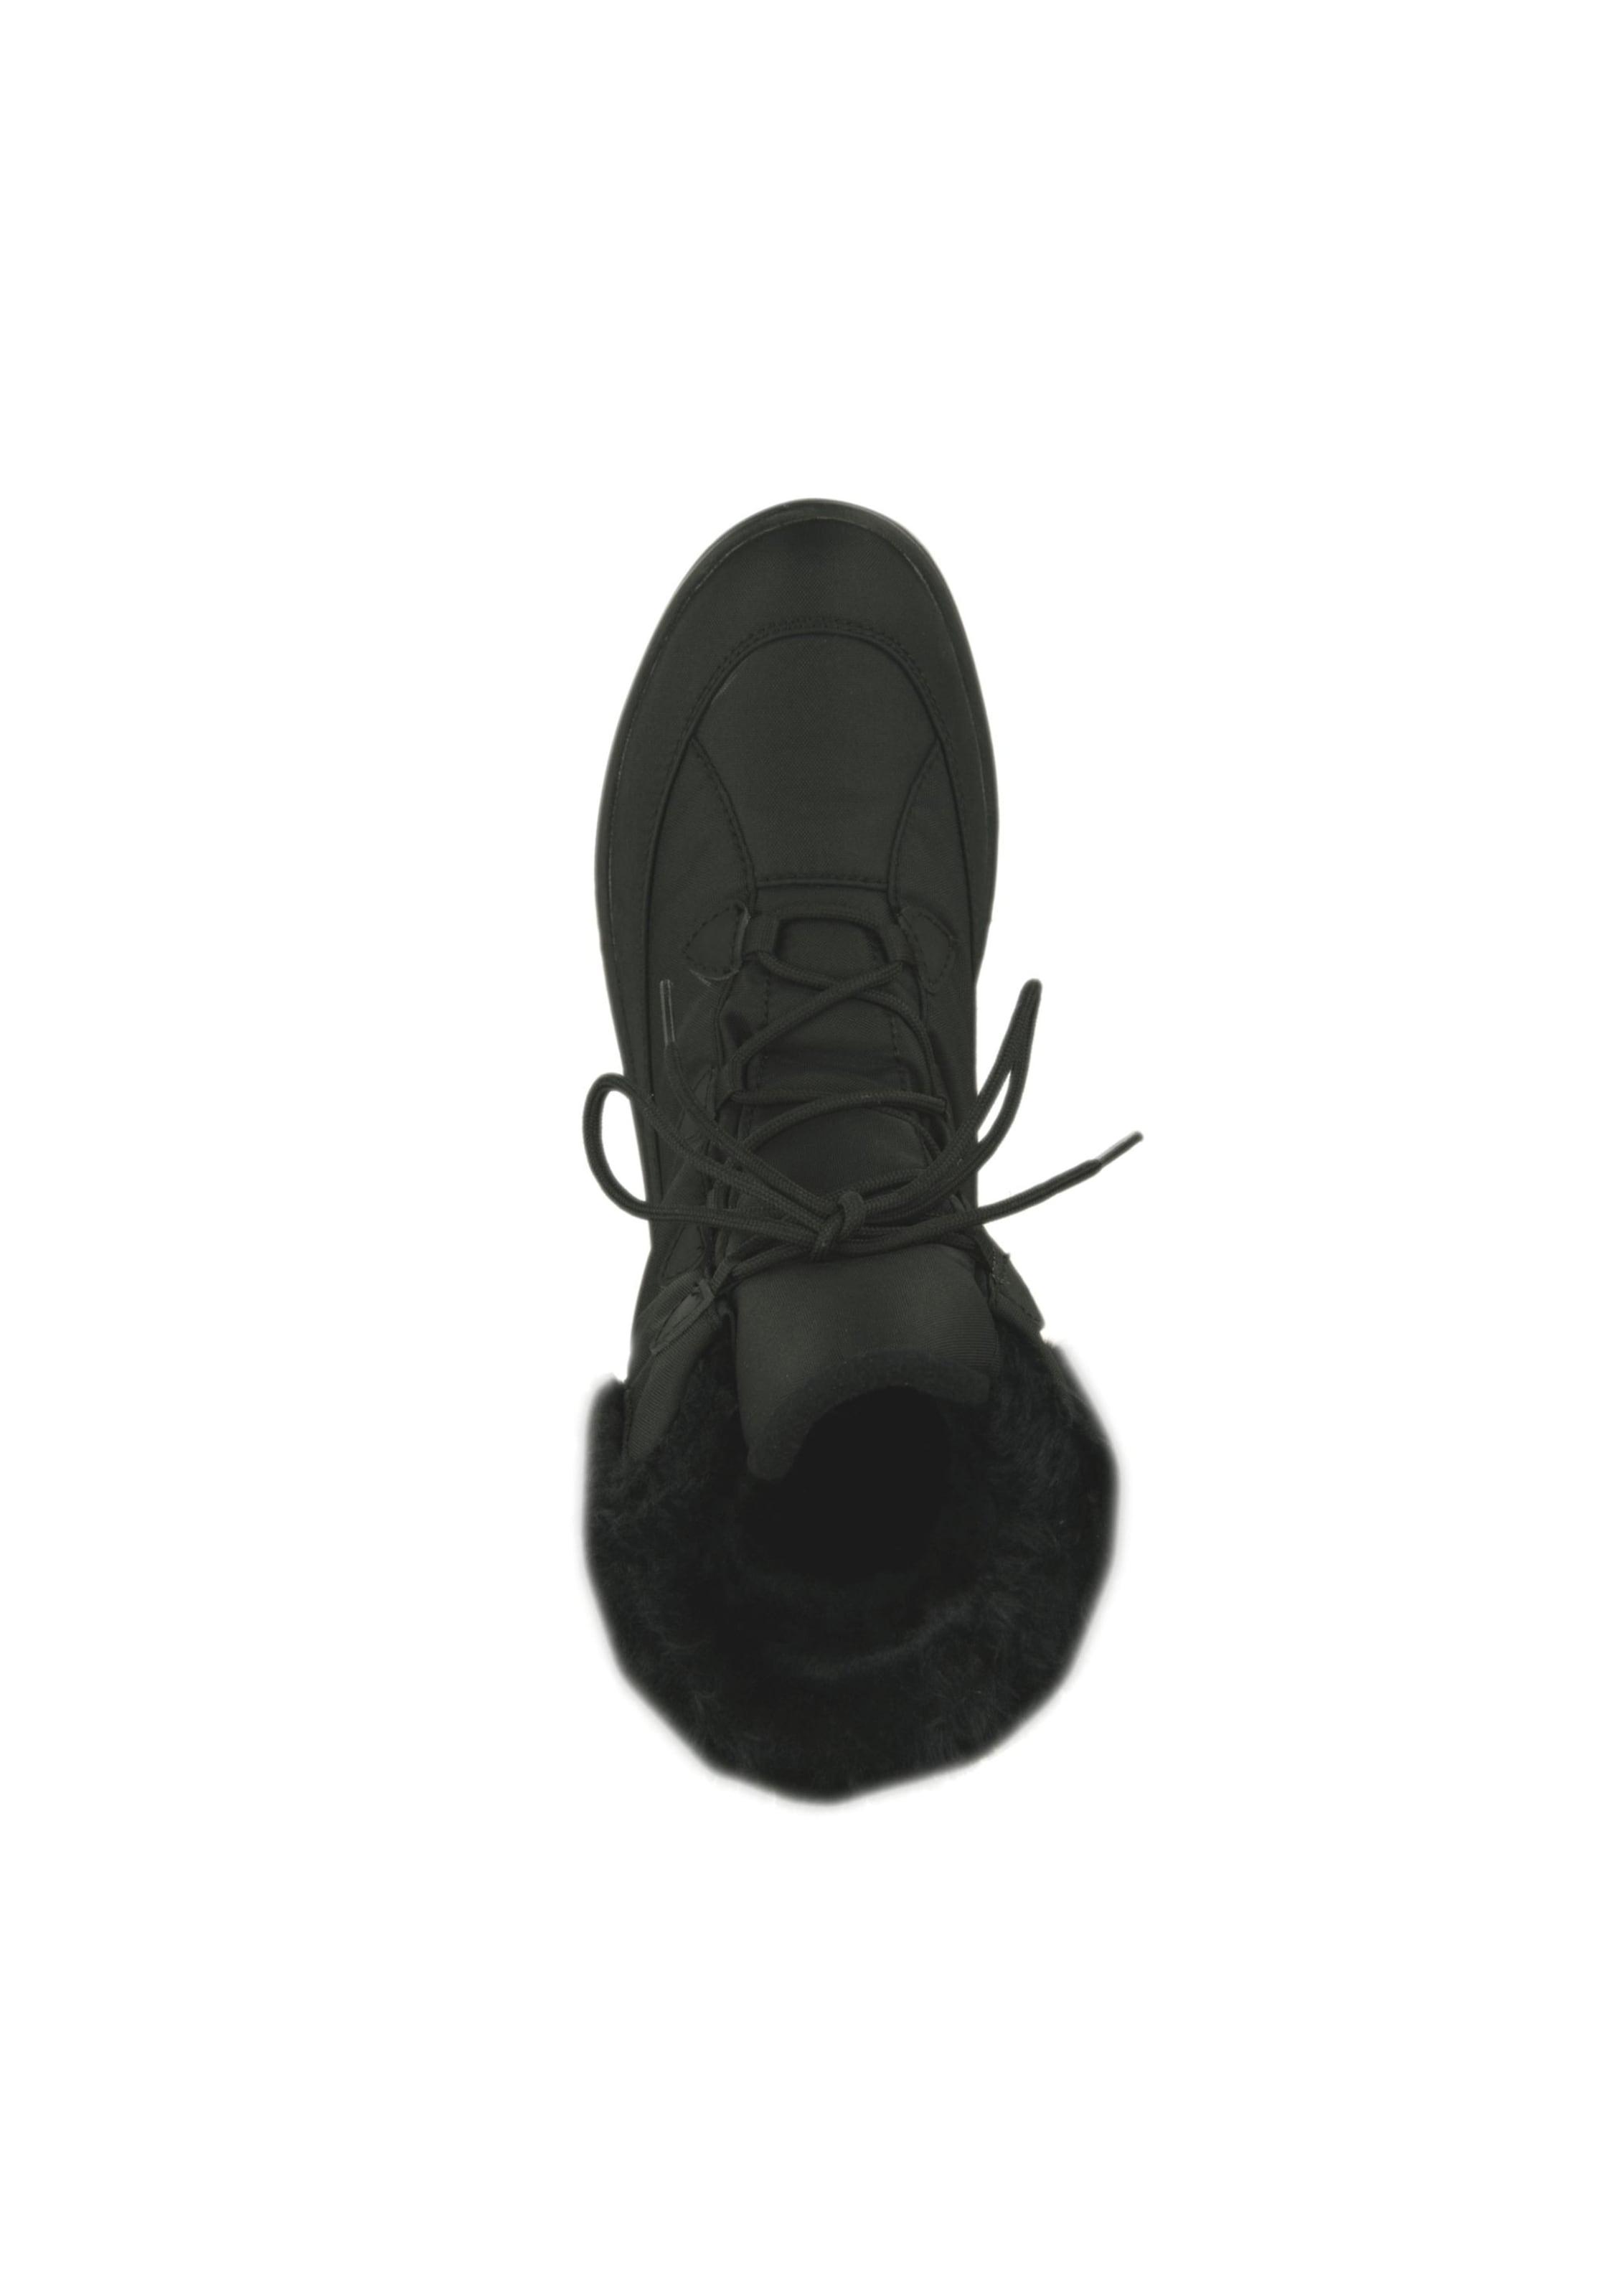 Feet 'akita' In Schwarz Natural Stiefelette 4jLqcR53SA